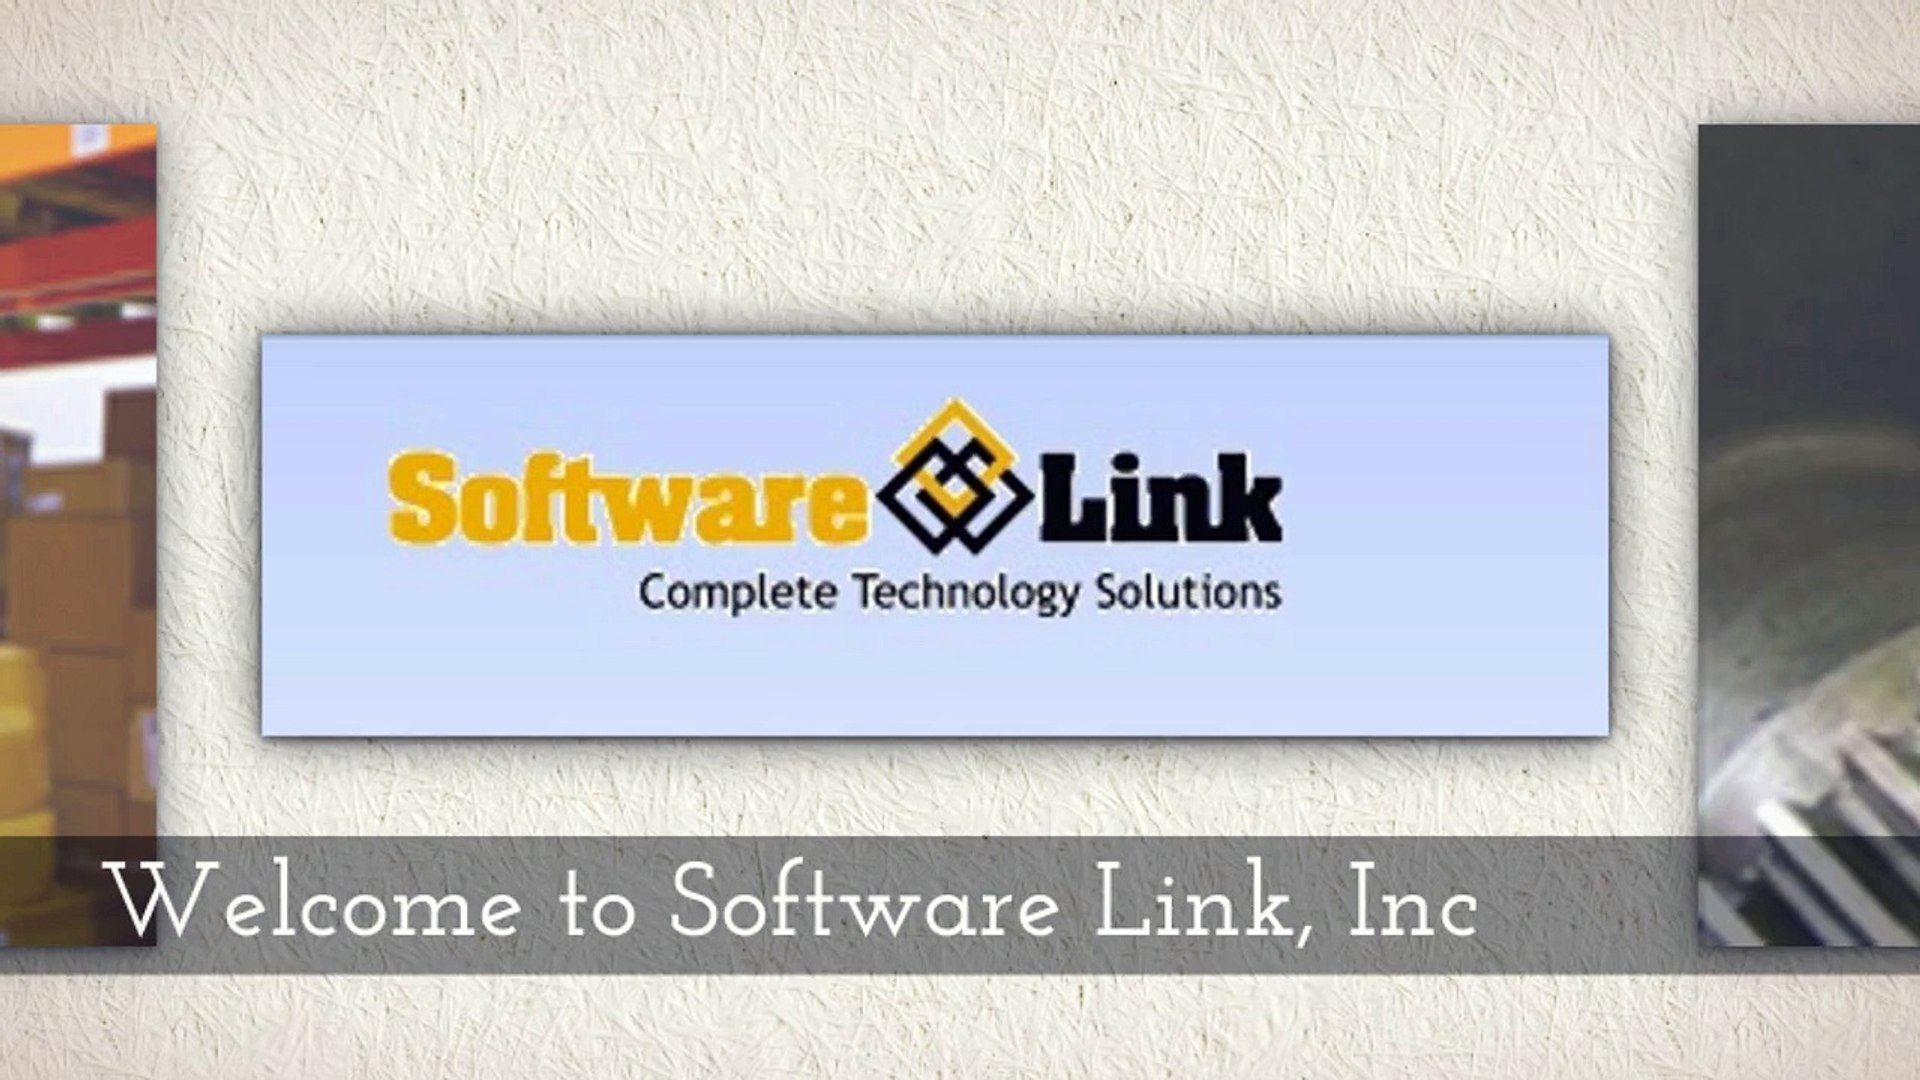 Softwarelink ERP Software from Software Link